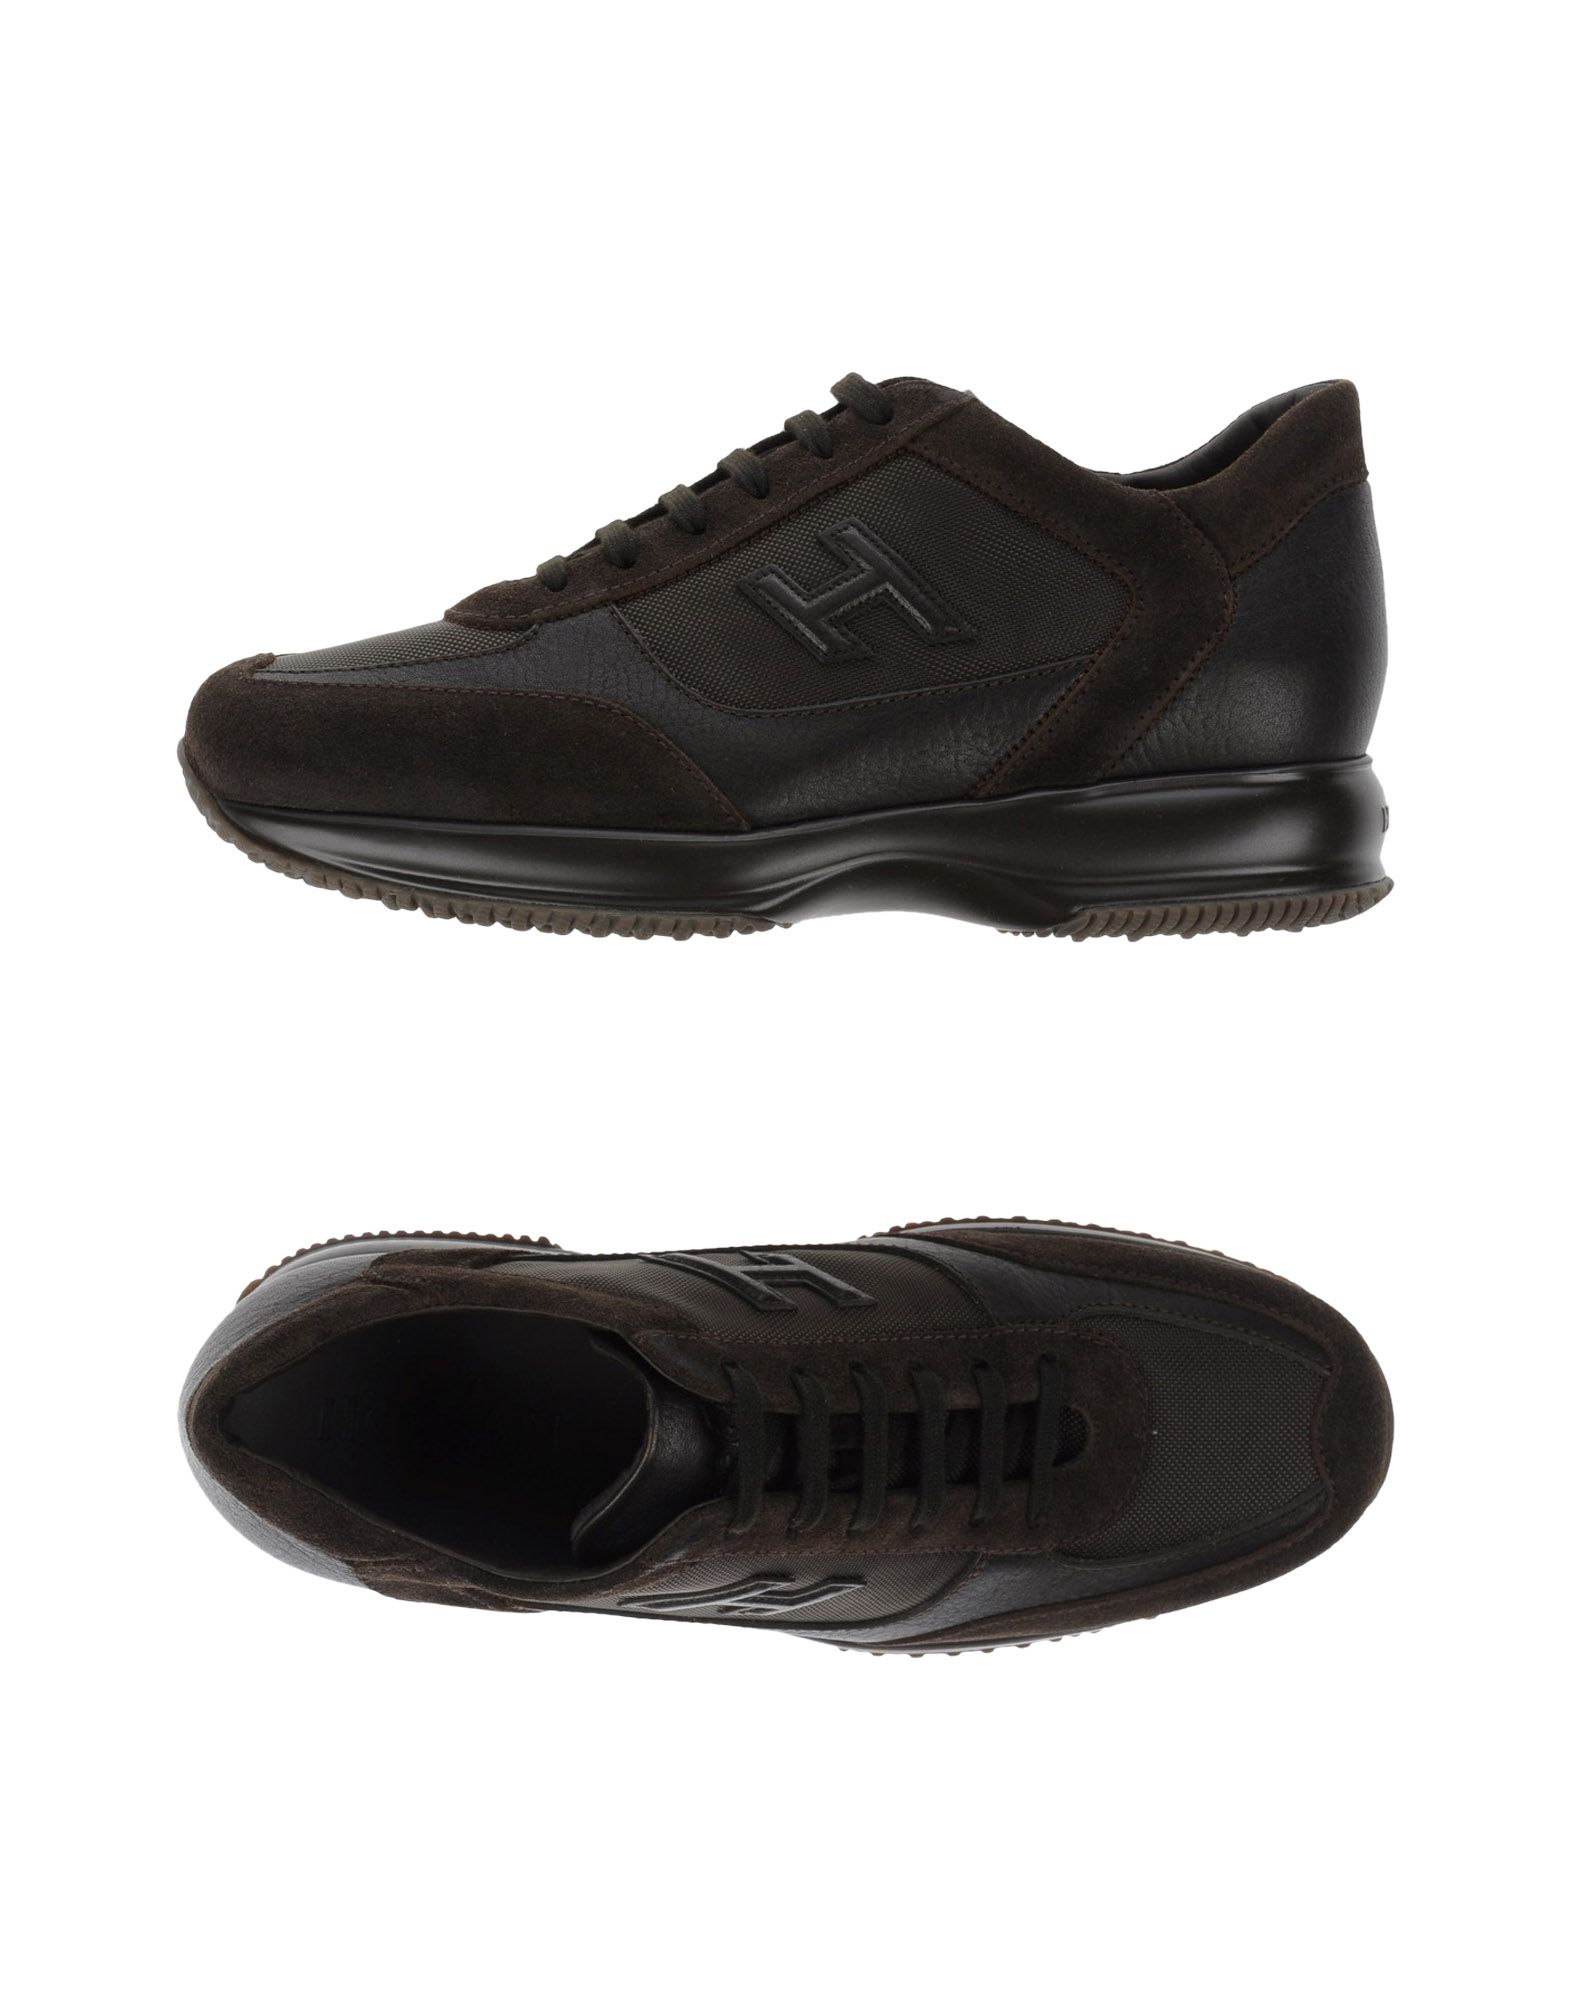 Hogan Sneakers Herren  11087888NR Gute Qualität beliebte Schuhe